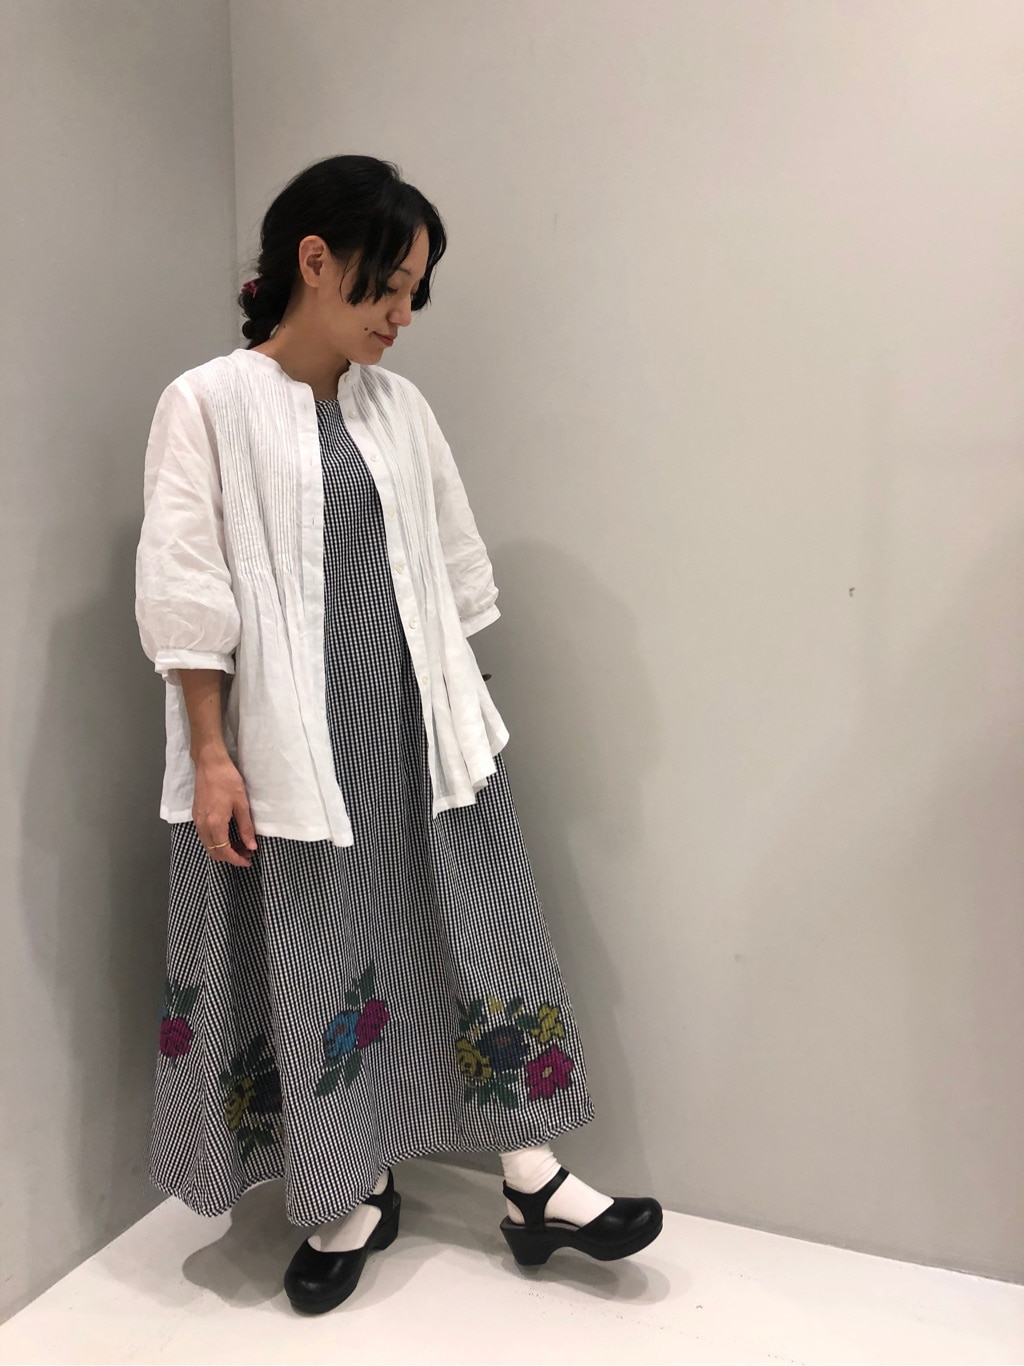 bulle de savon なんばシティ 身長:148cm 2020.08.19